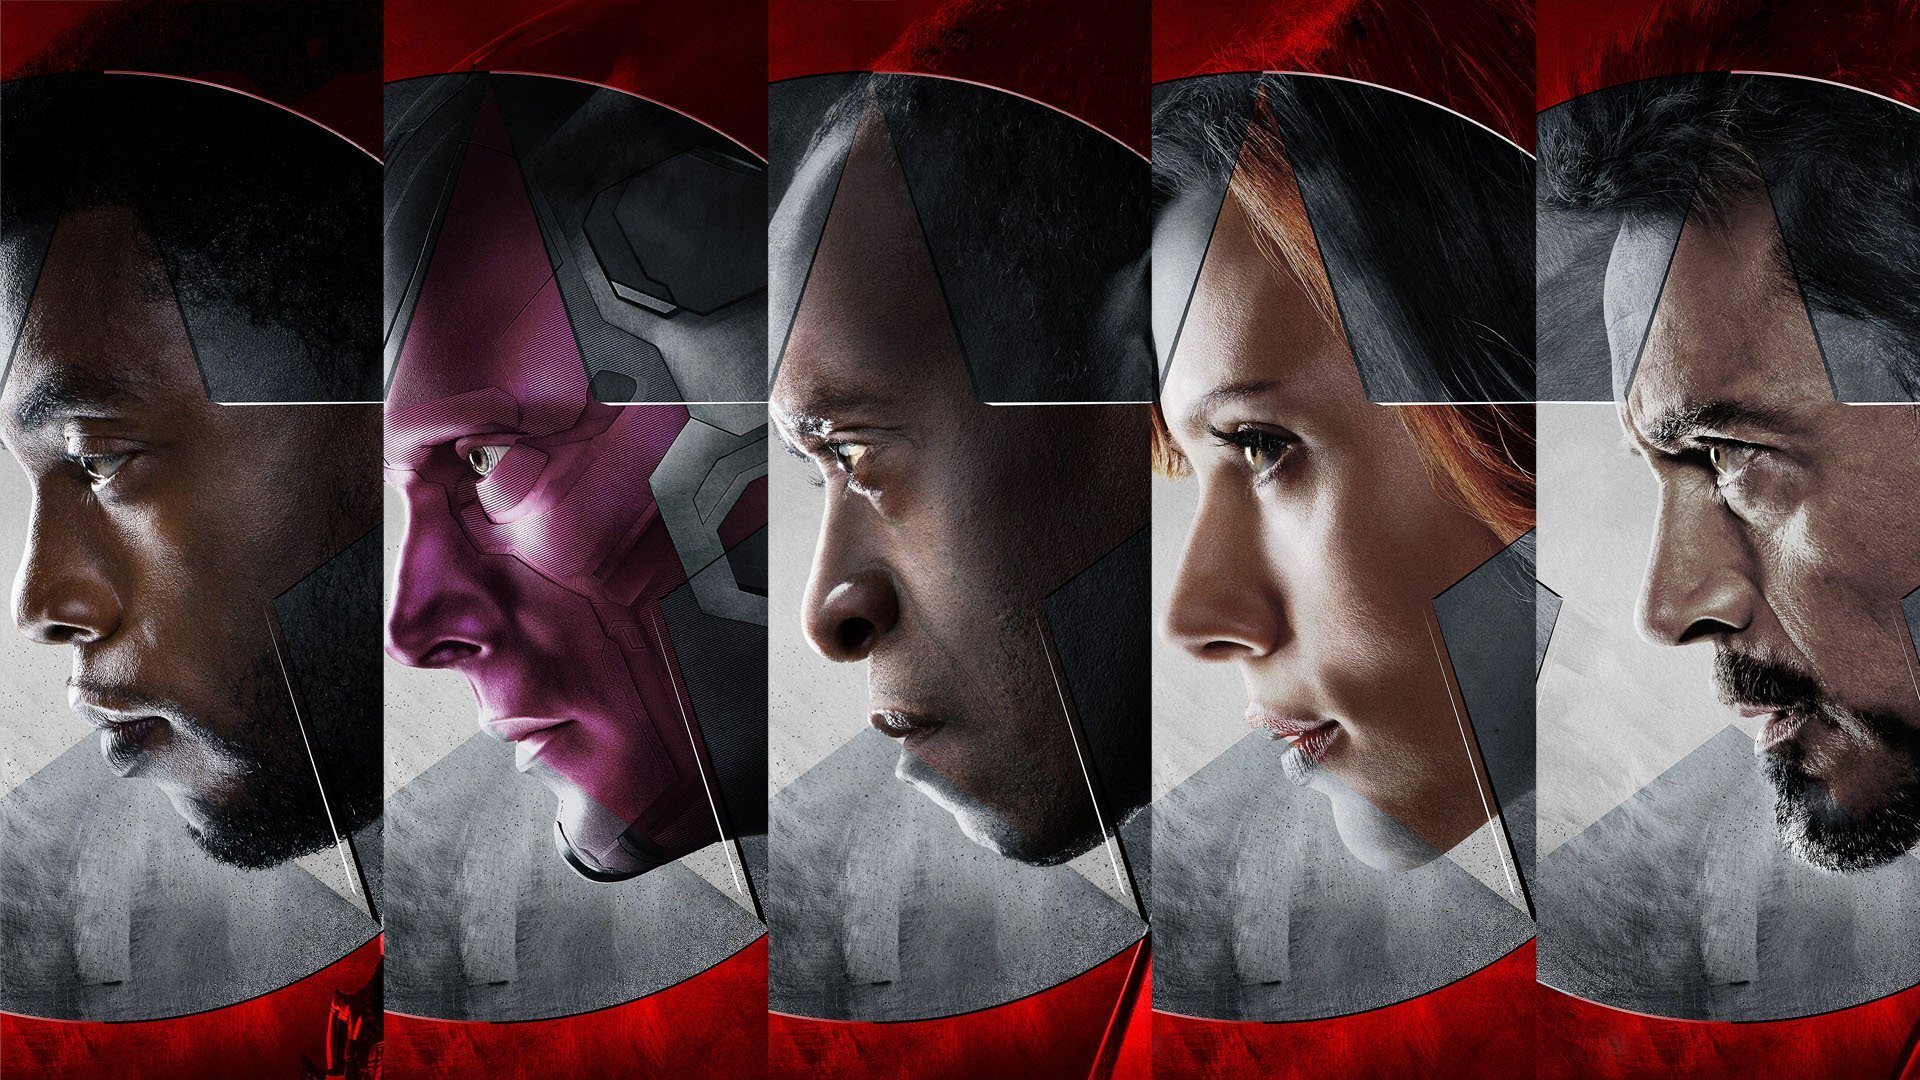 Captain America Civil War 4k: 1920x1080 Captain America Civil War Marvel Laptop Full HD